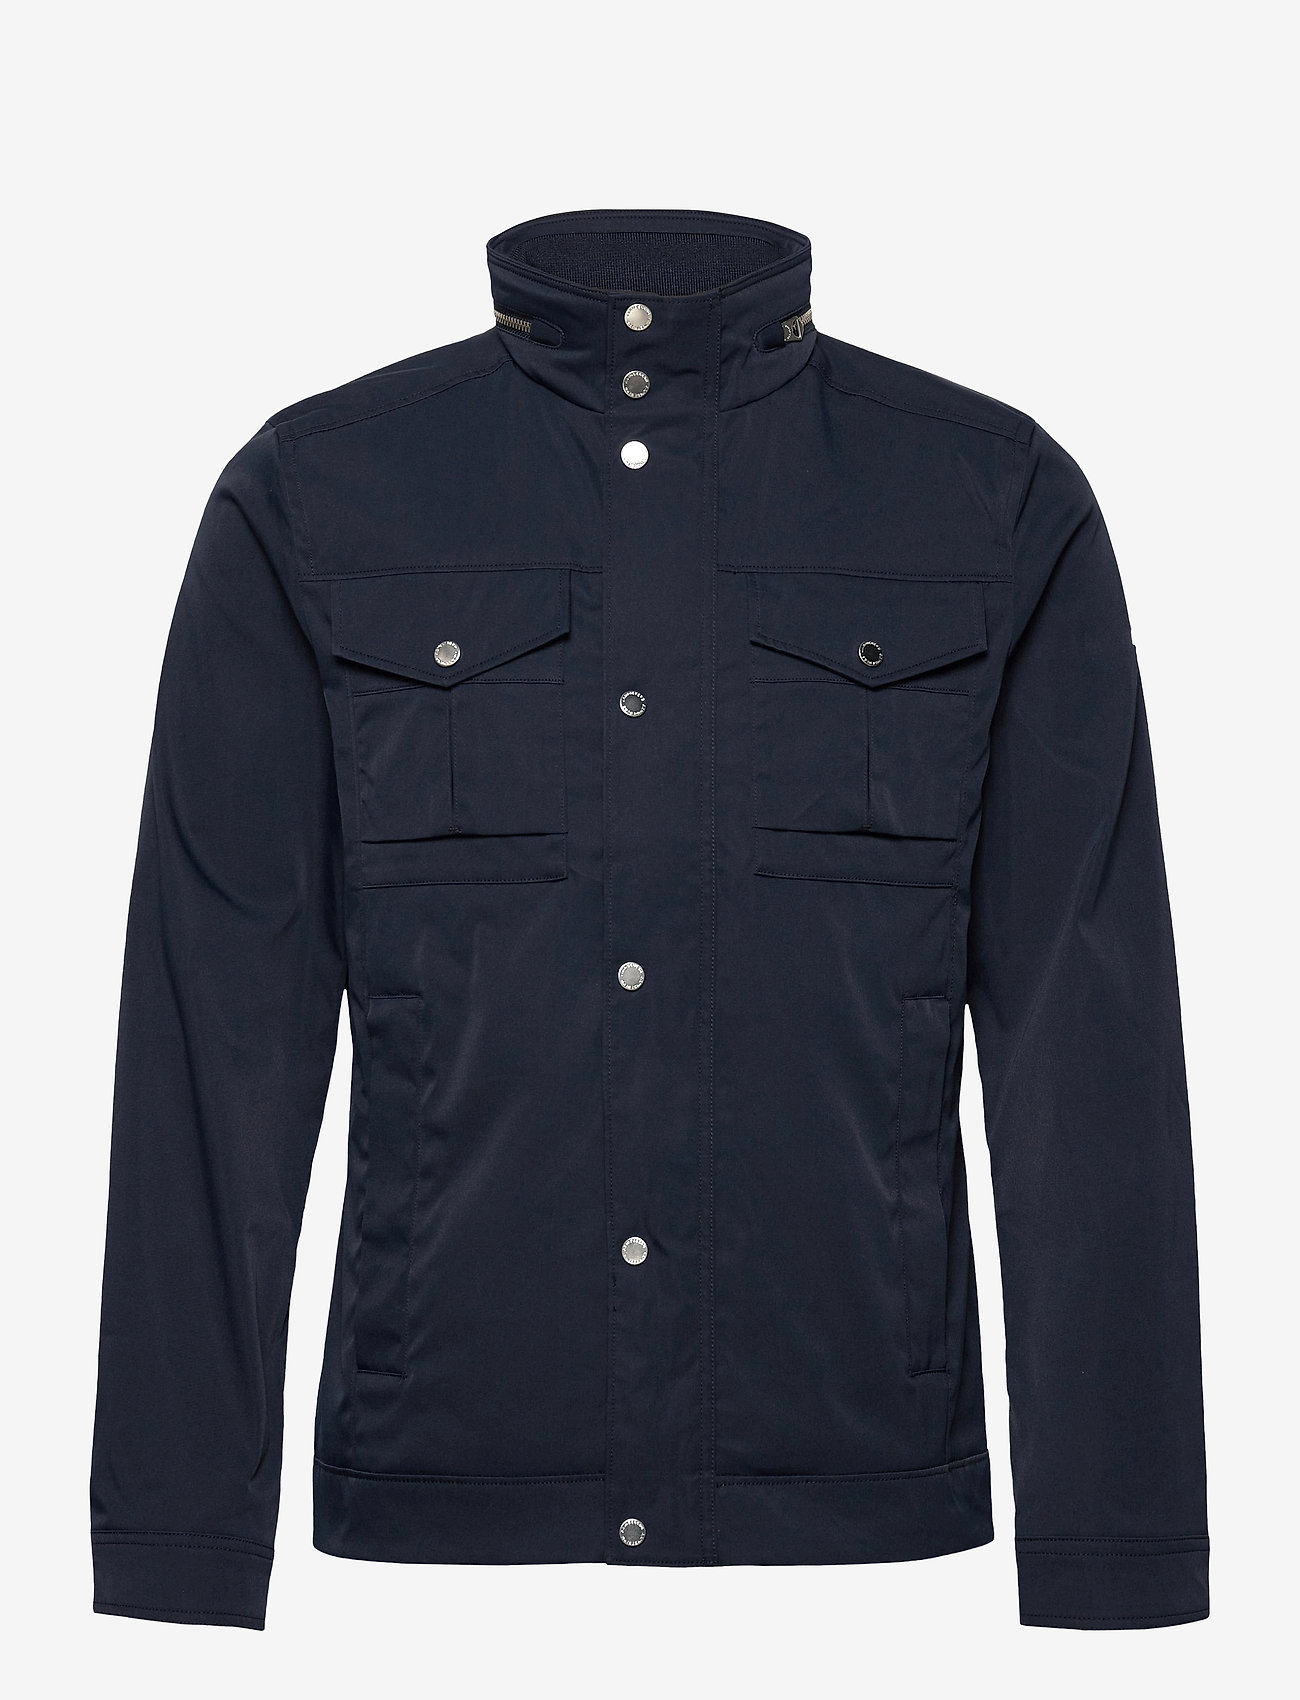 J. Lindeberg - Bailey Poly Stretch jacket - leichte jacken - jl navy - 1